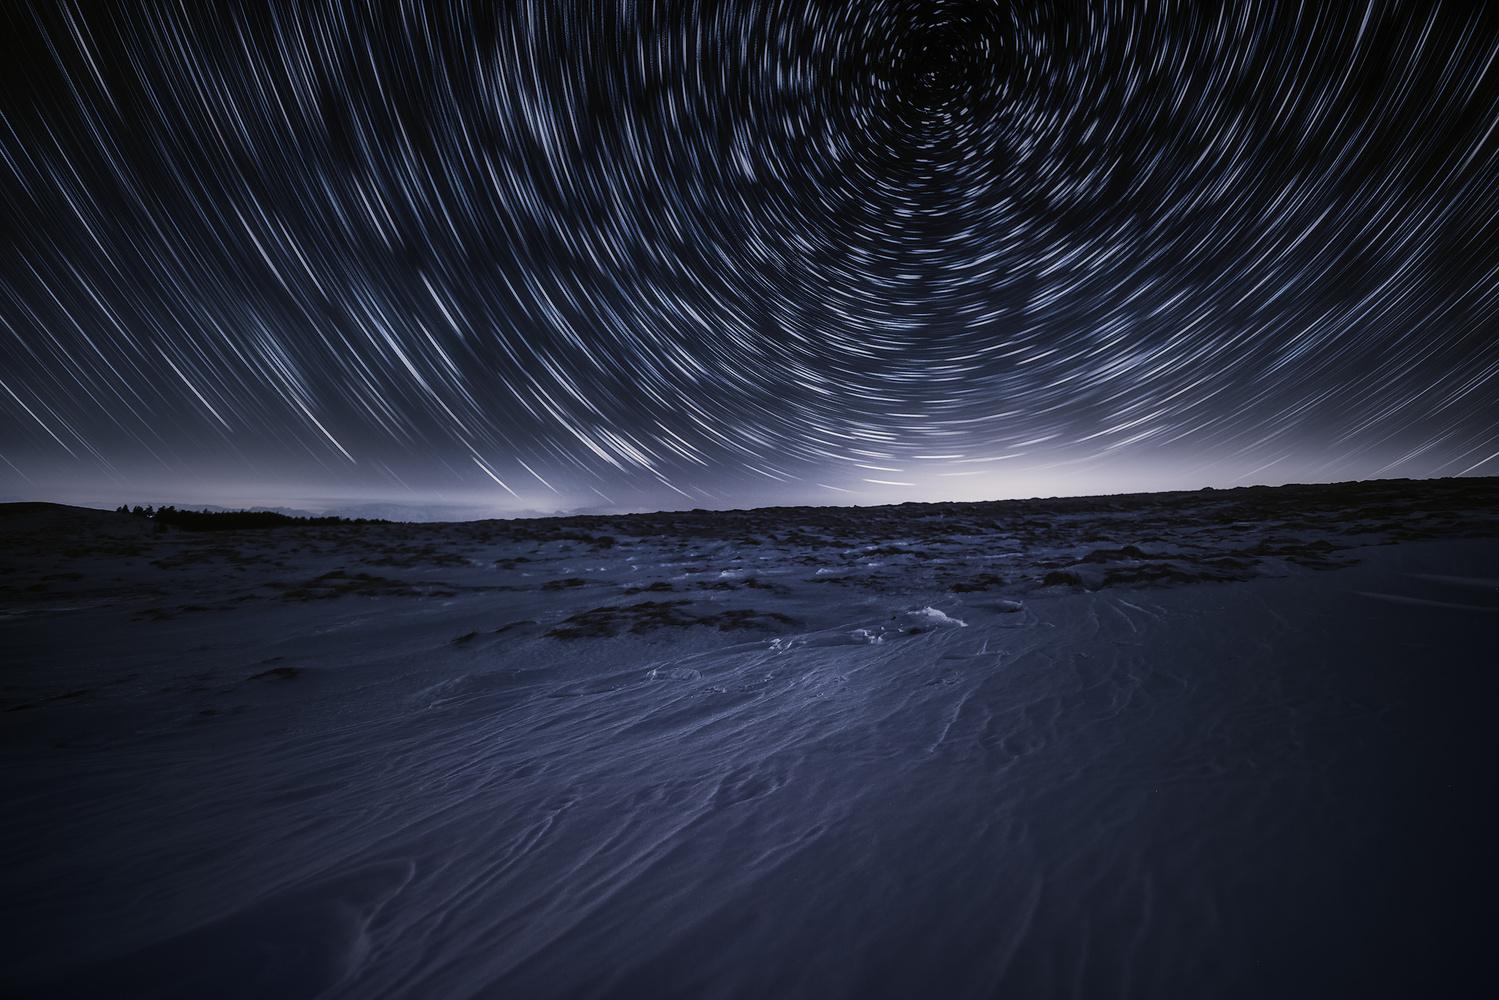 Into the starcircle by Shumon Saito